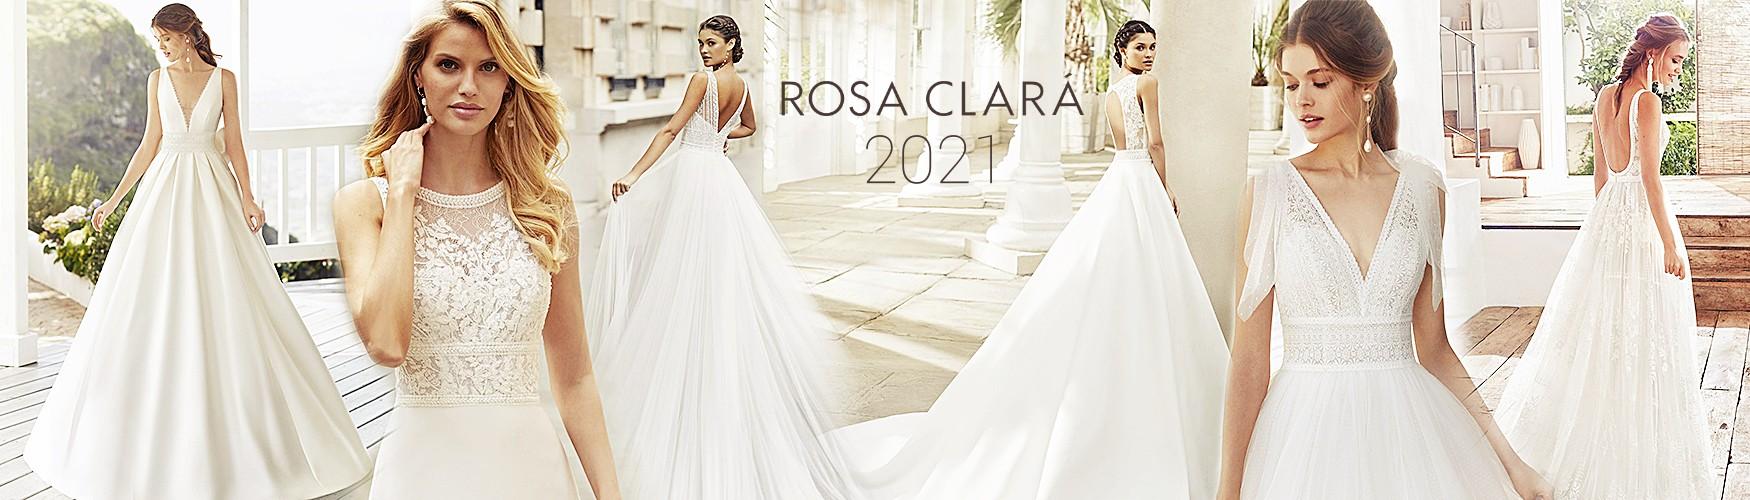 Rosa Clara 2021